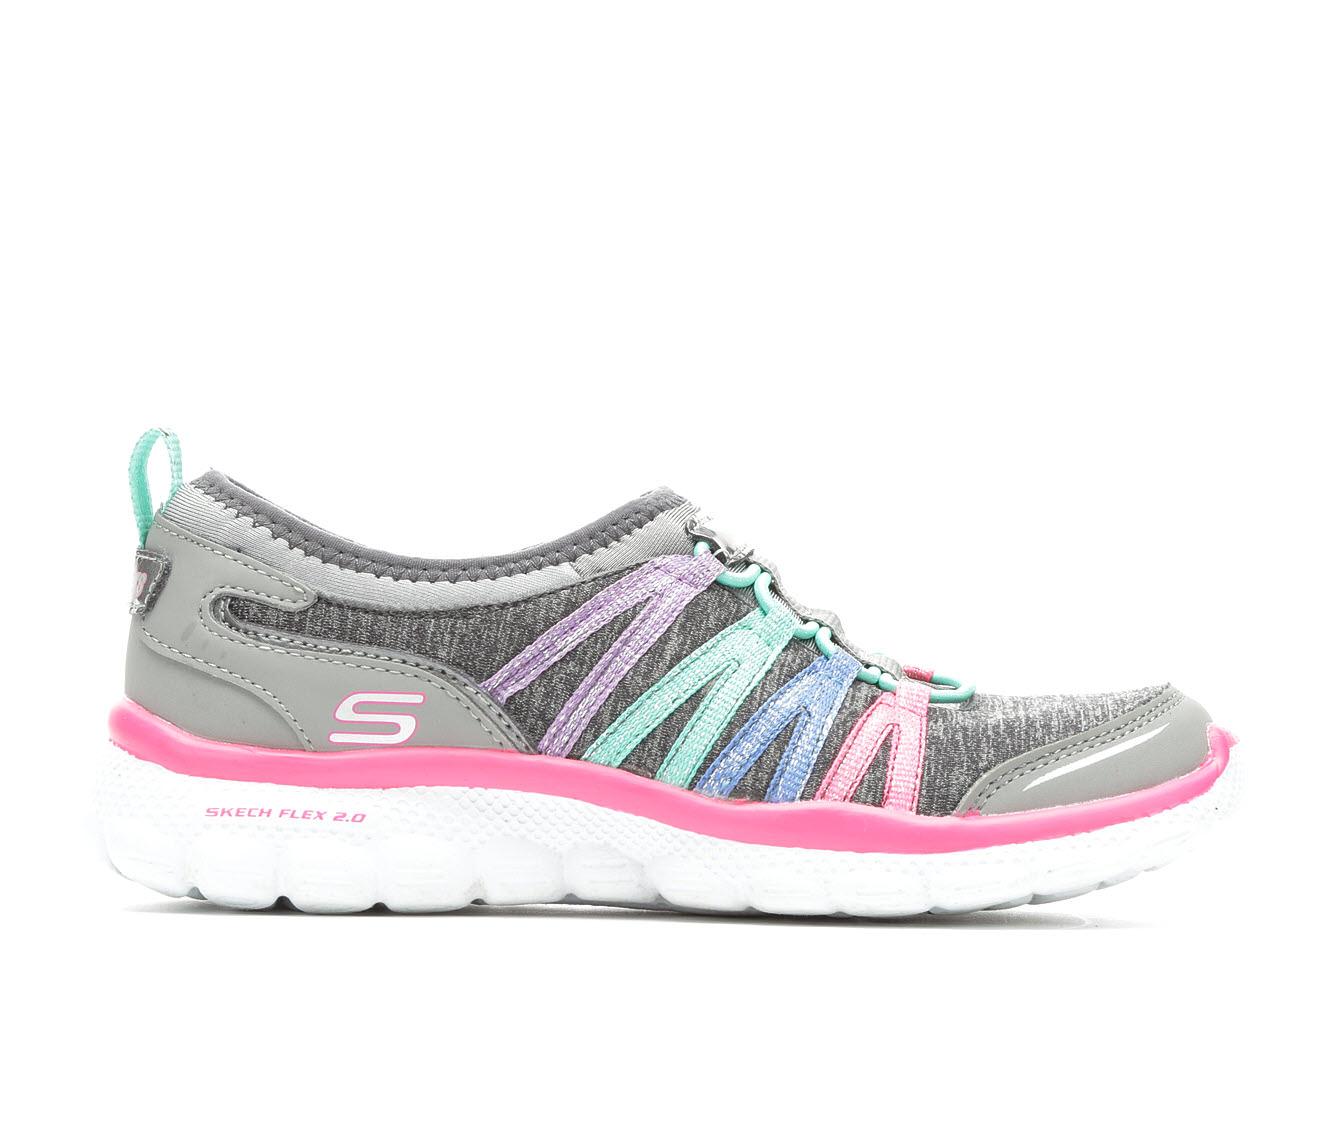 Girls' Skechers Flex 2.0 Children's Shoes (Grey)